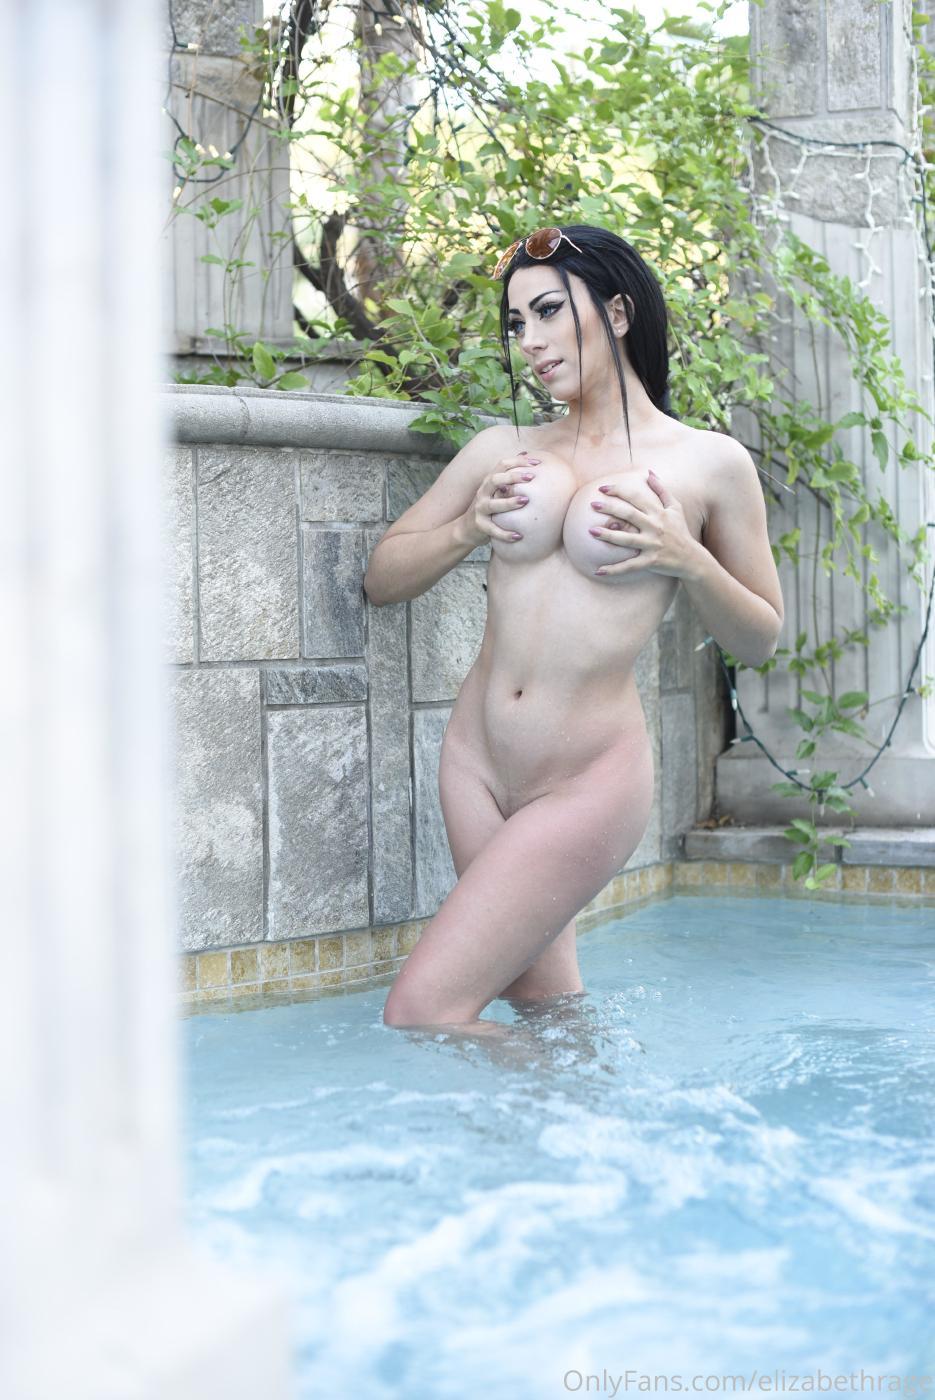 Elizabeth Rage Nude Outdoor Pool Onlyfans Set Leaked 0034